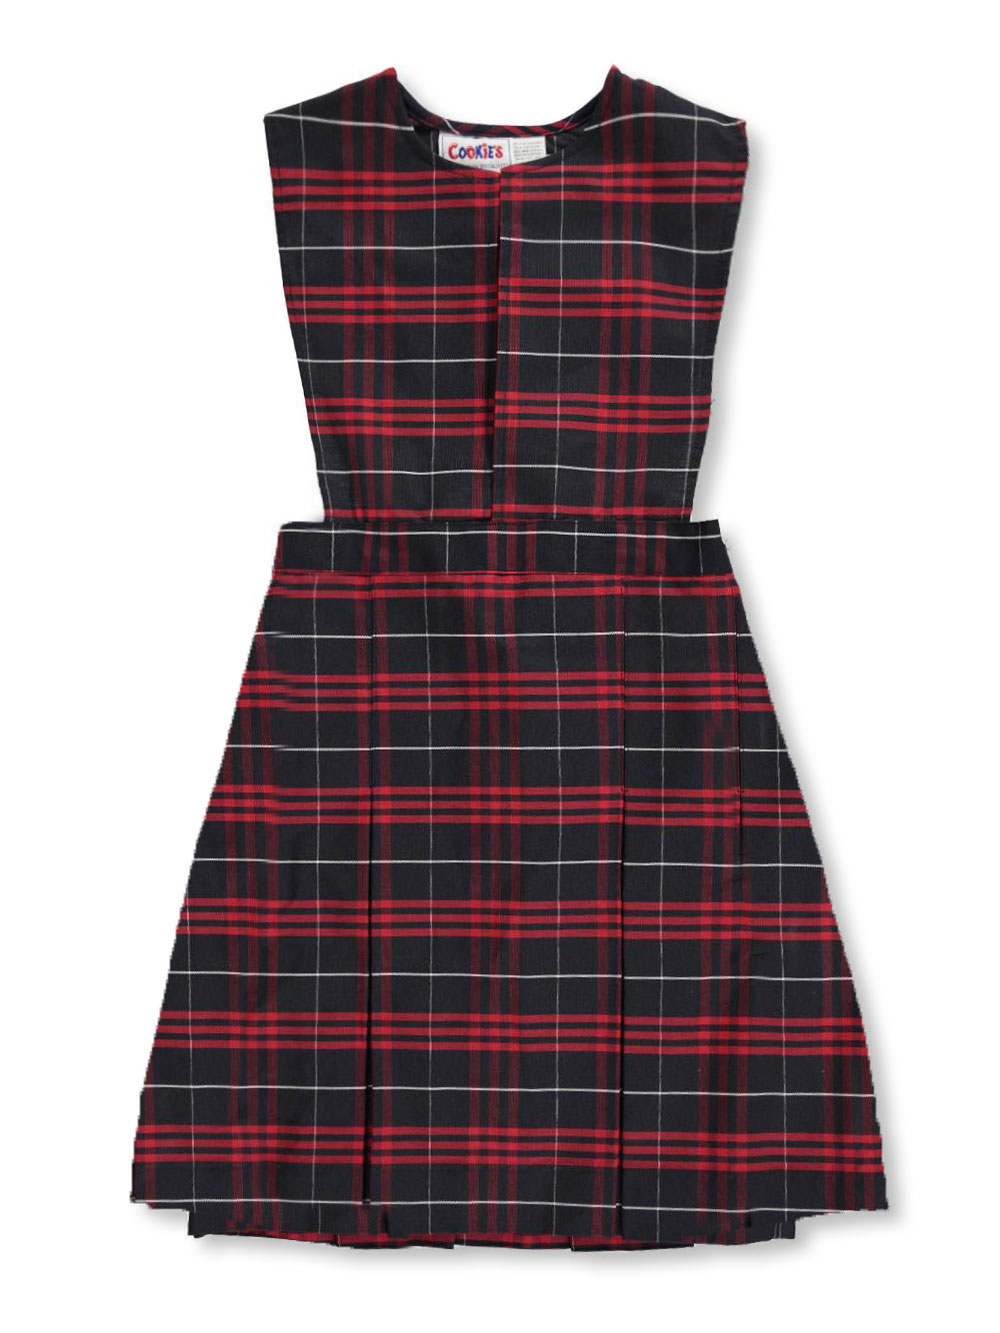 Cookie's Brand School Uniform Cookie's Brand School Uniform Big Girls' Slit Neck Jumper With Kick Pleats (Sizes 7 - 20) - navy/red/white *plaid #37, 8